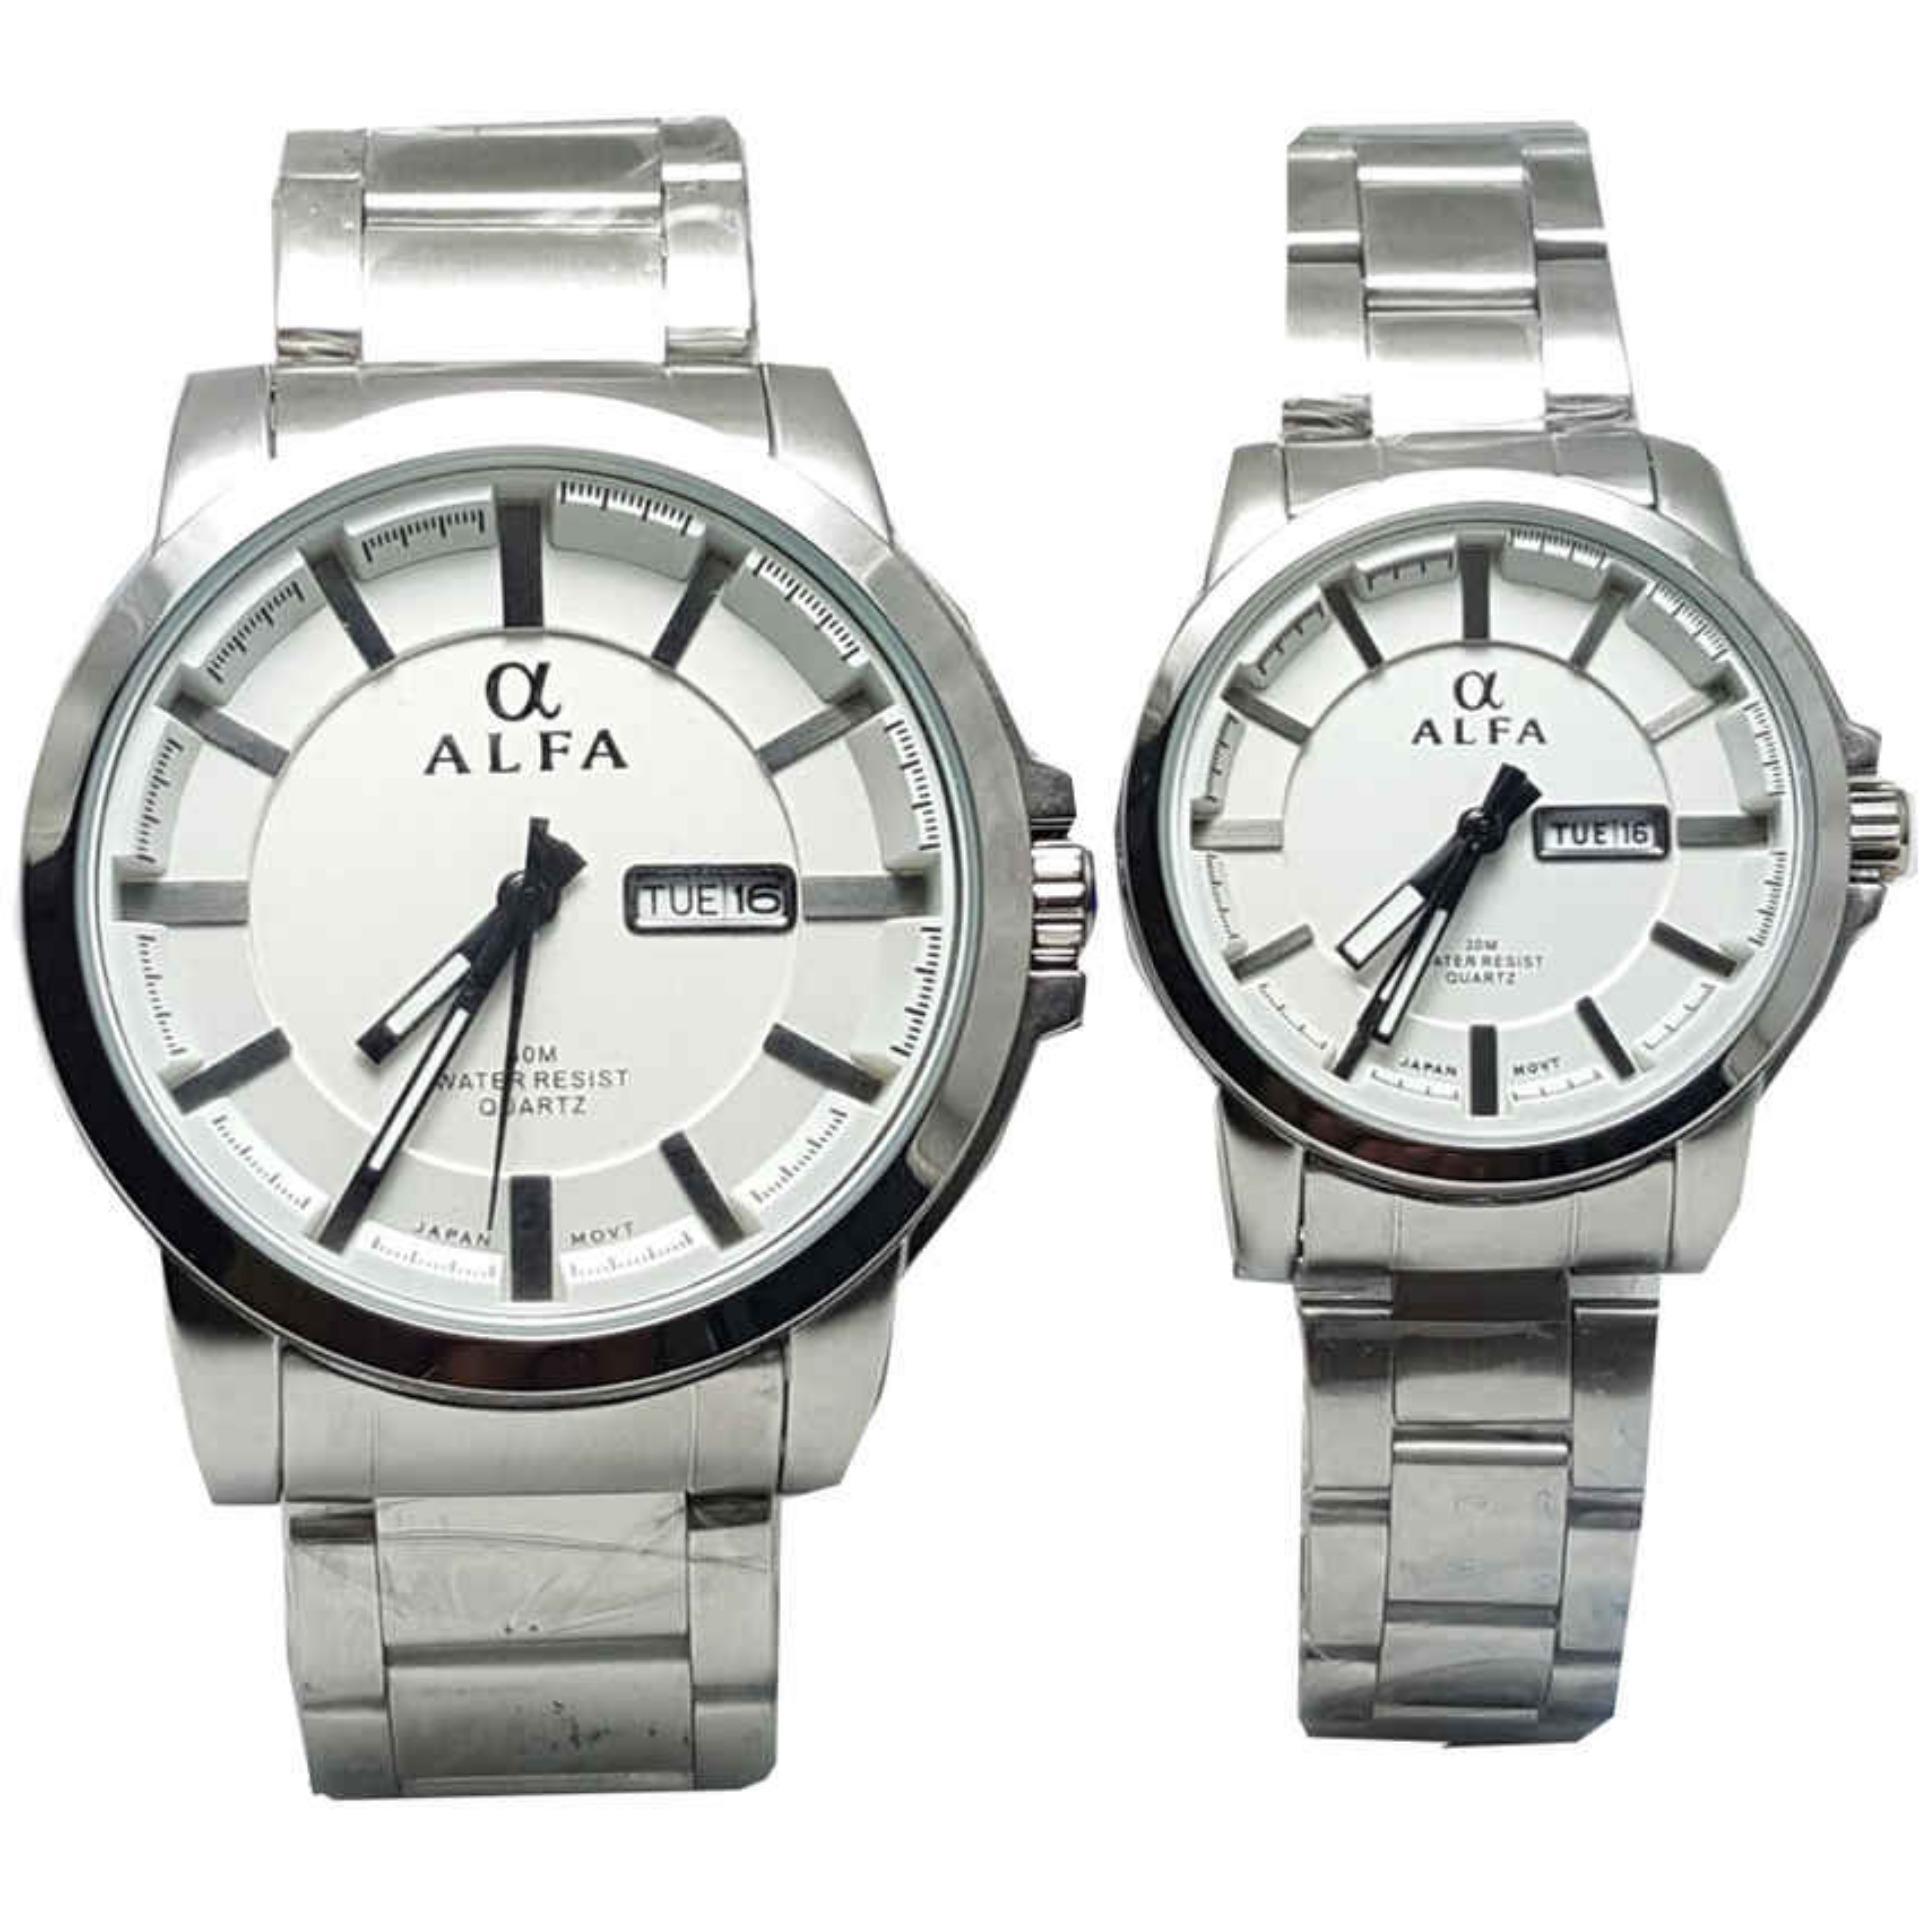 ... Alfa watch ALF099 Jam Tangan Couple Strap Stainless Steel Silver Tanggal Hari Lazada Indonesia